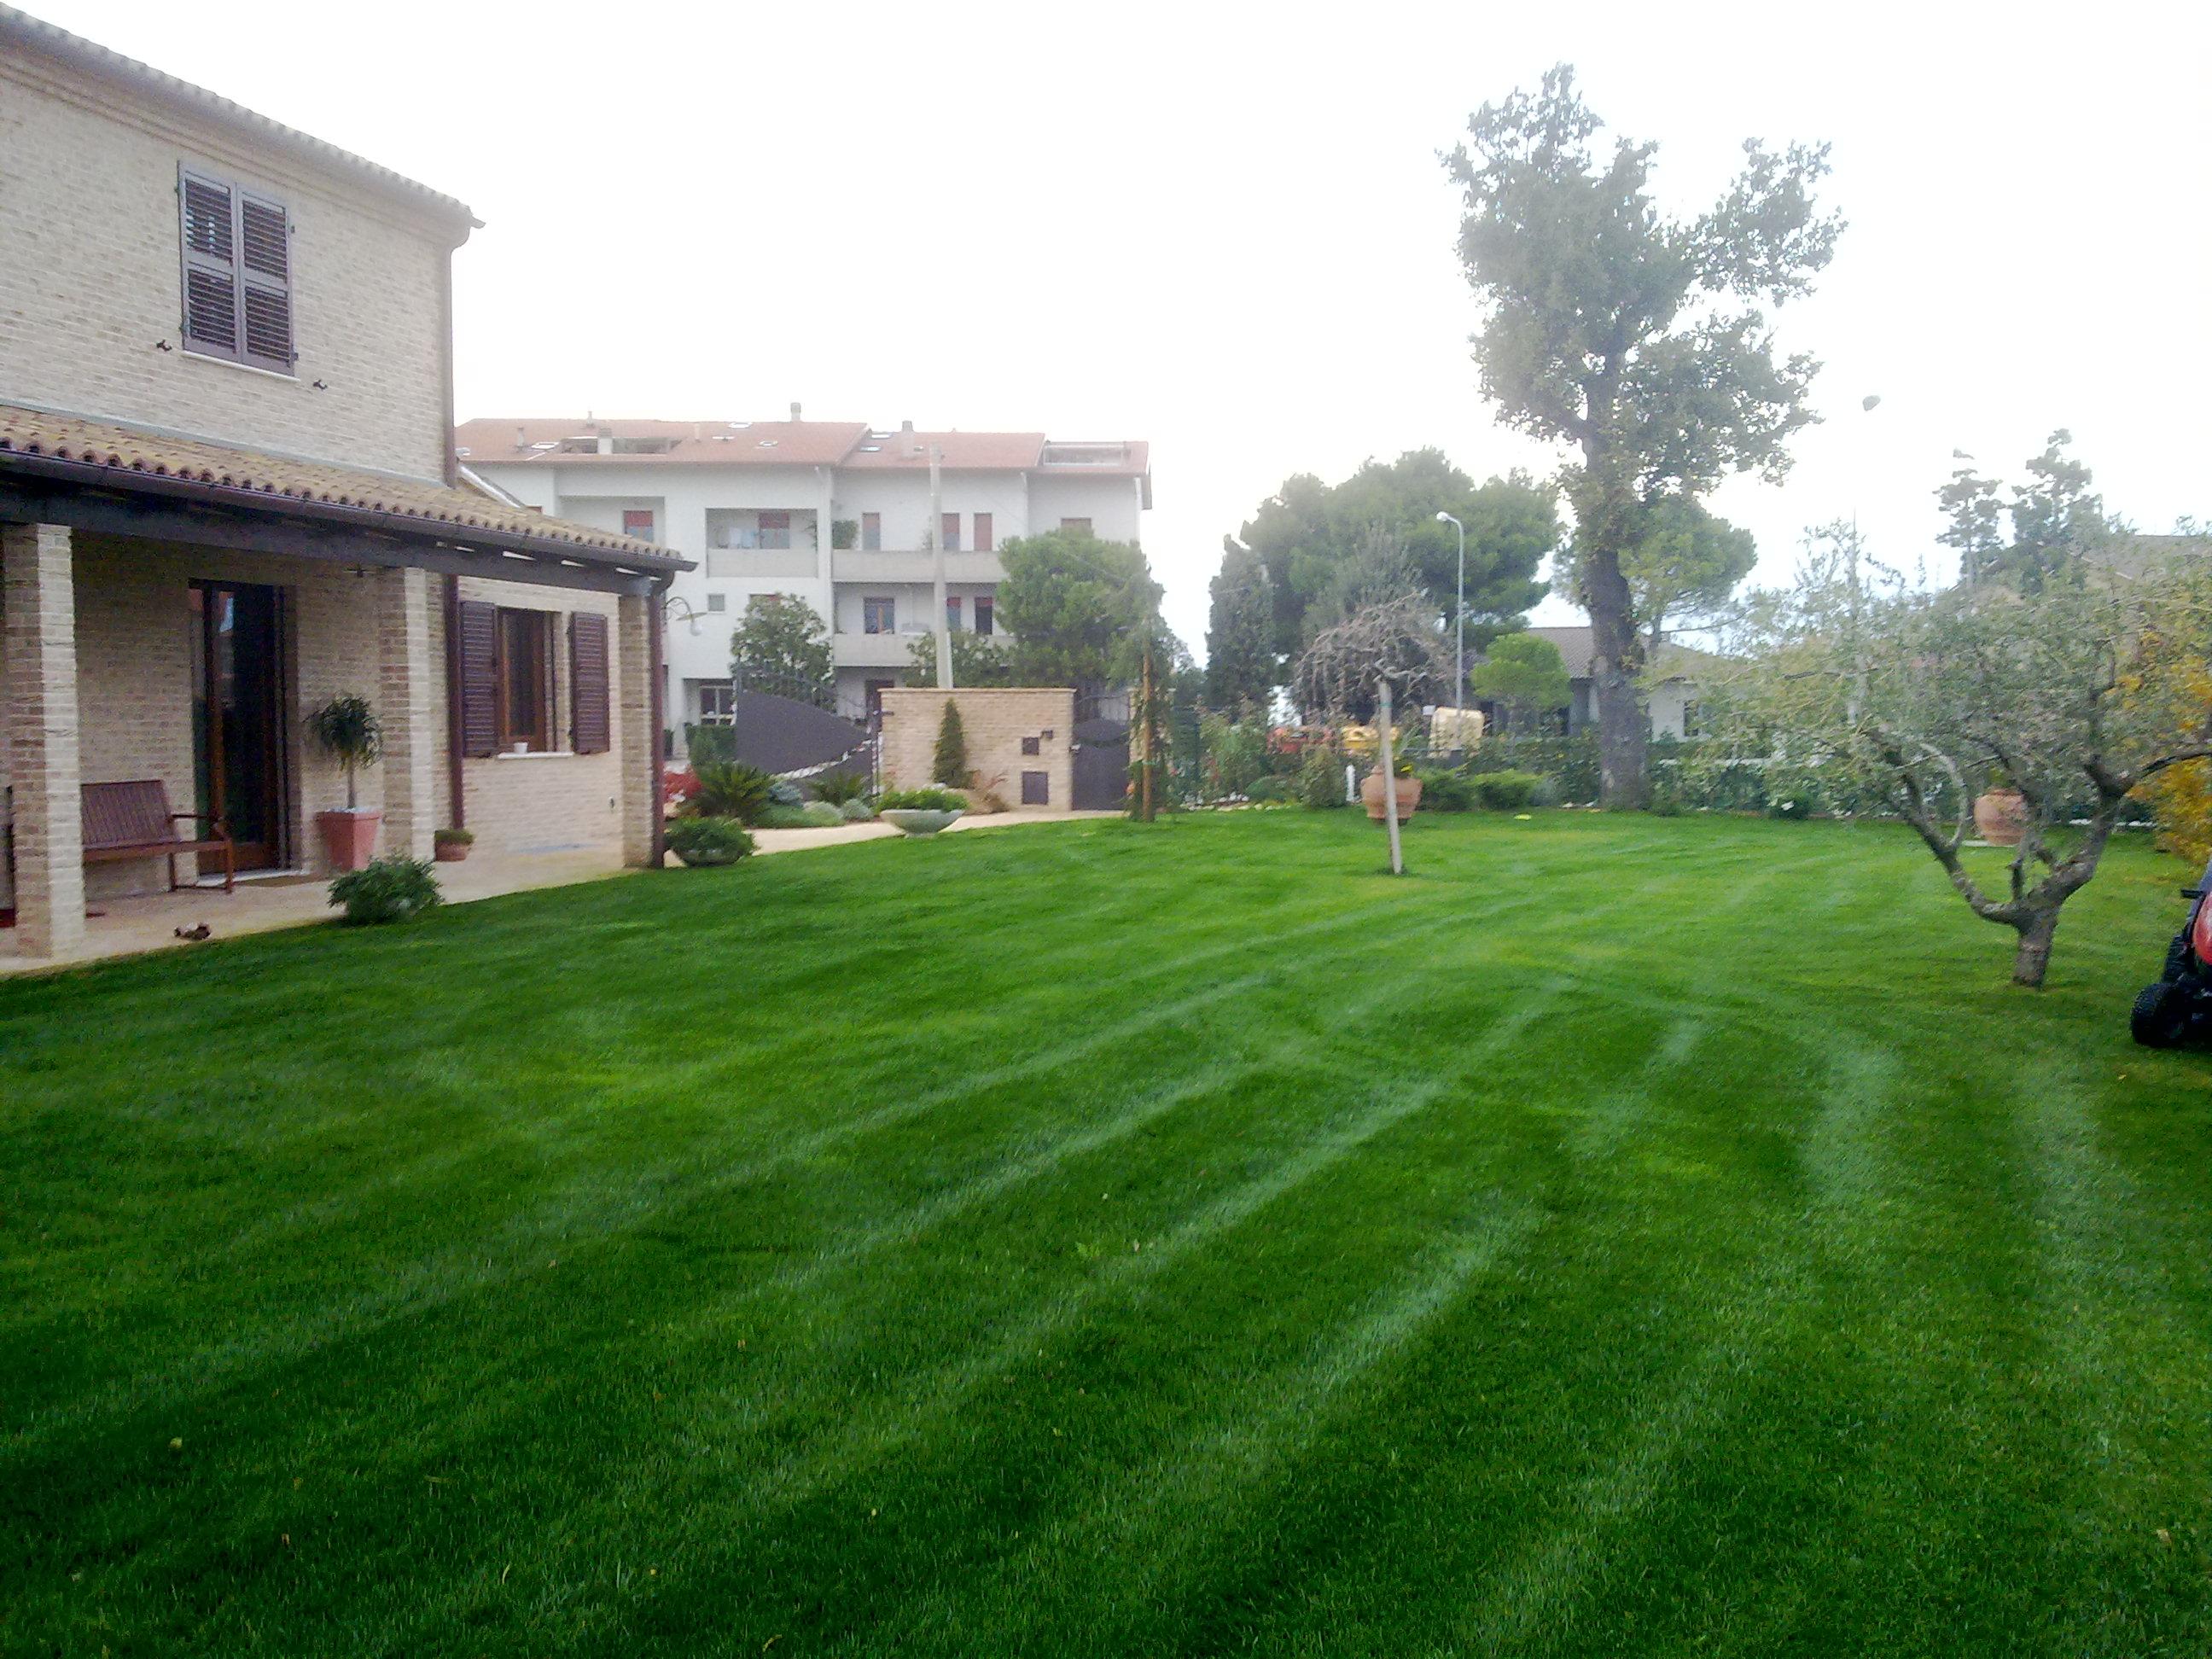 Al Giardino Ancona progettazione giardini - giardinaggio full garden jesi ancona